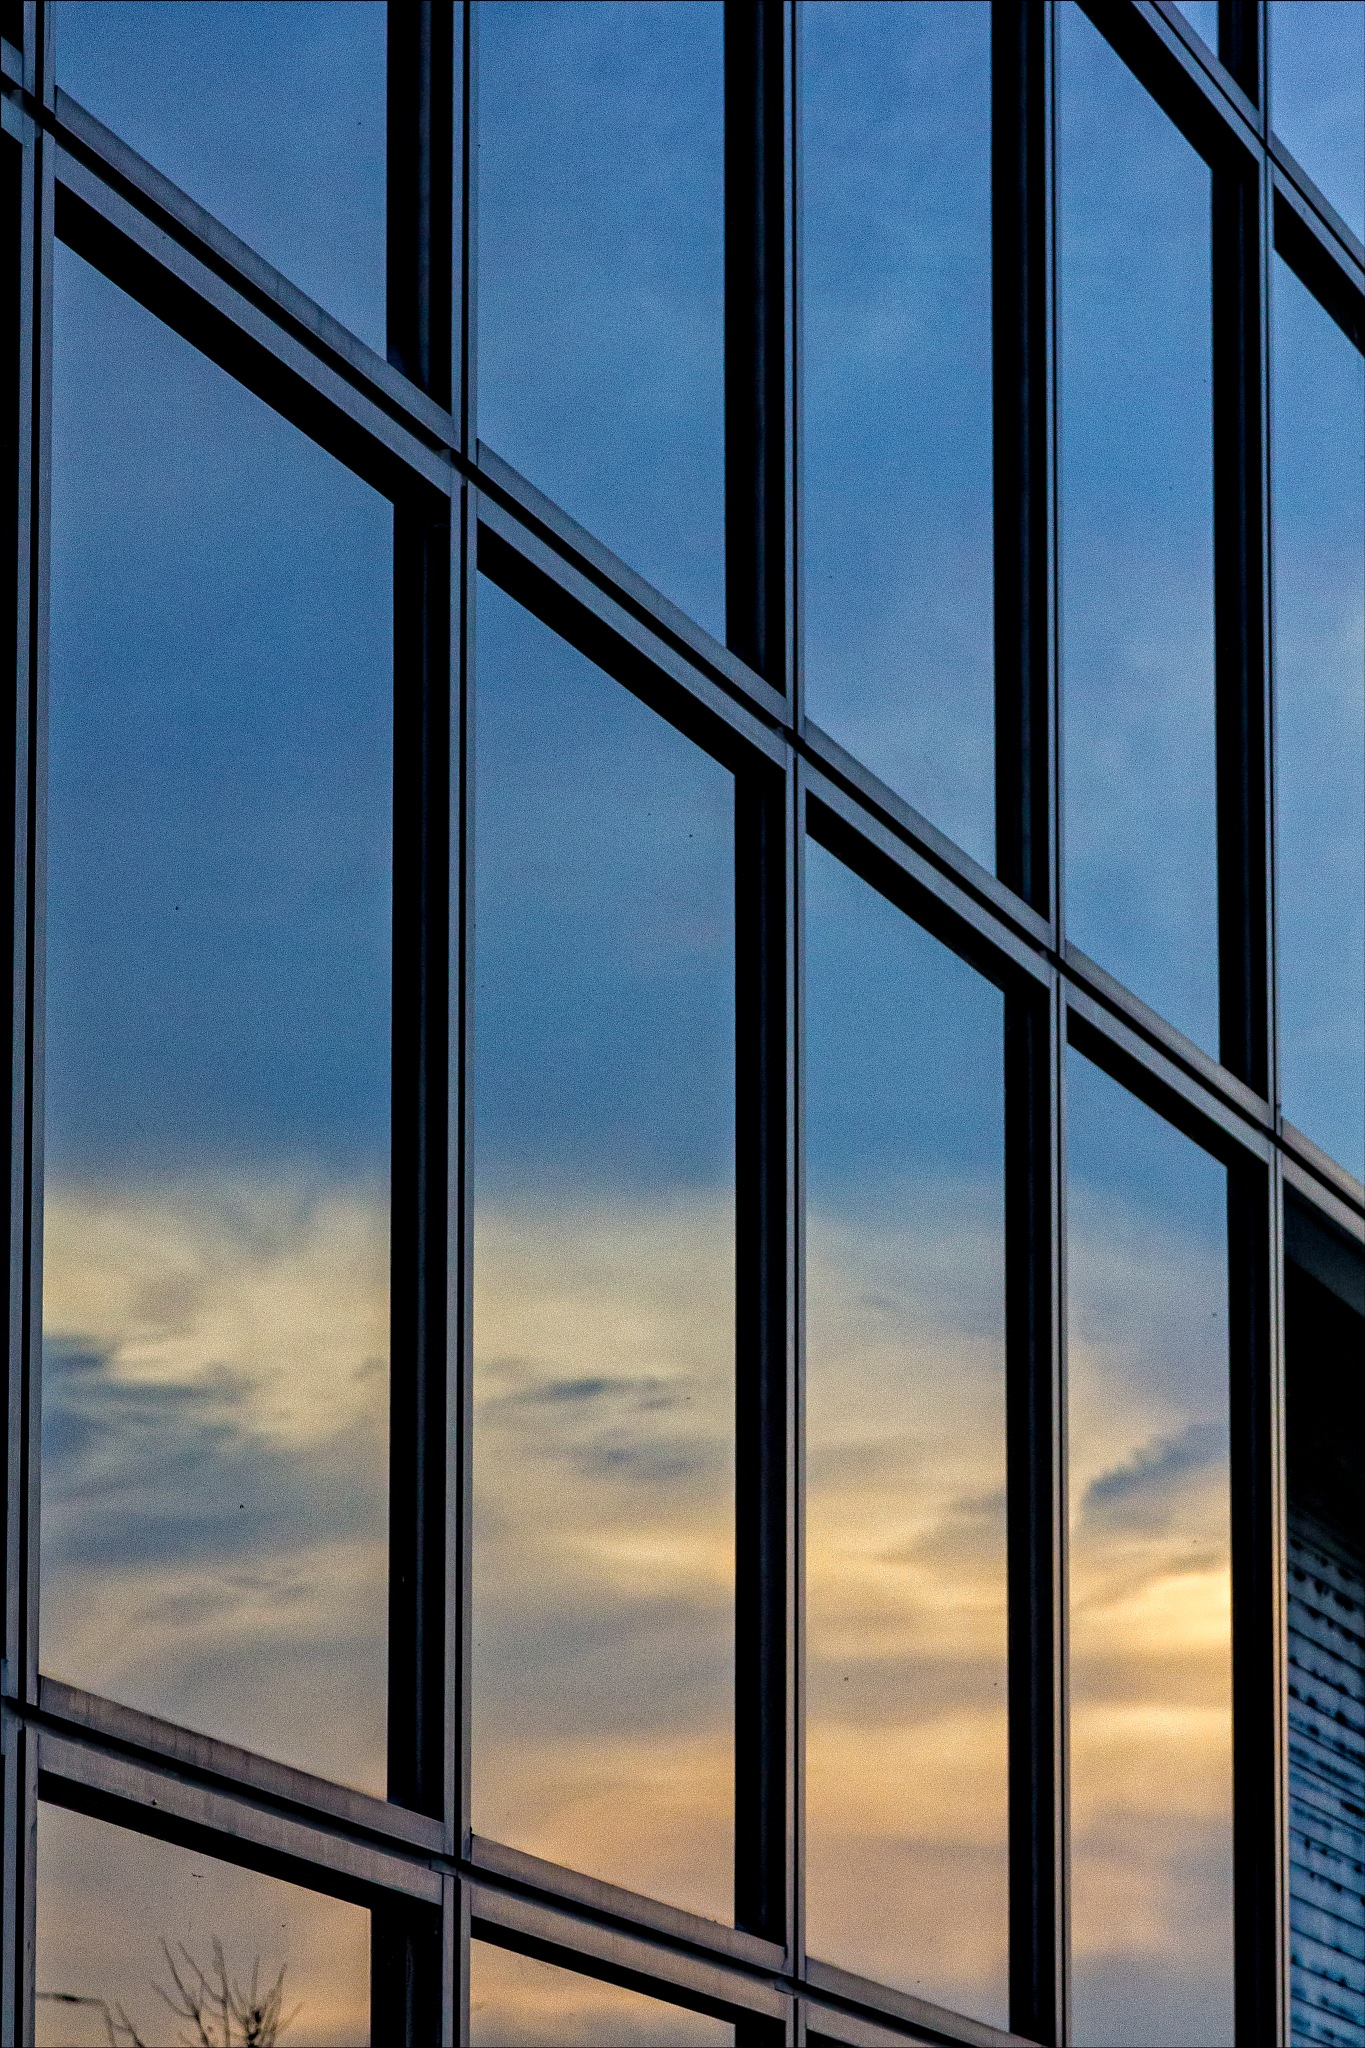 Glass Architecture  by robertullmann